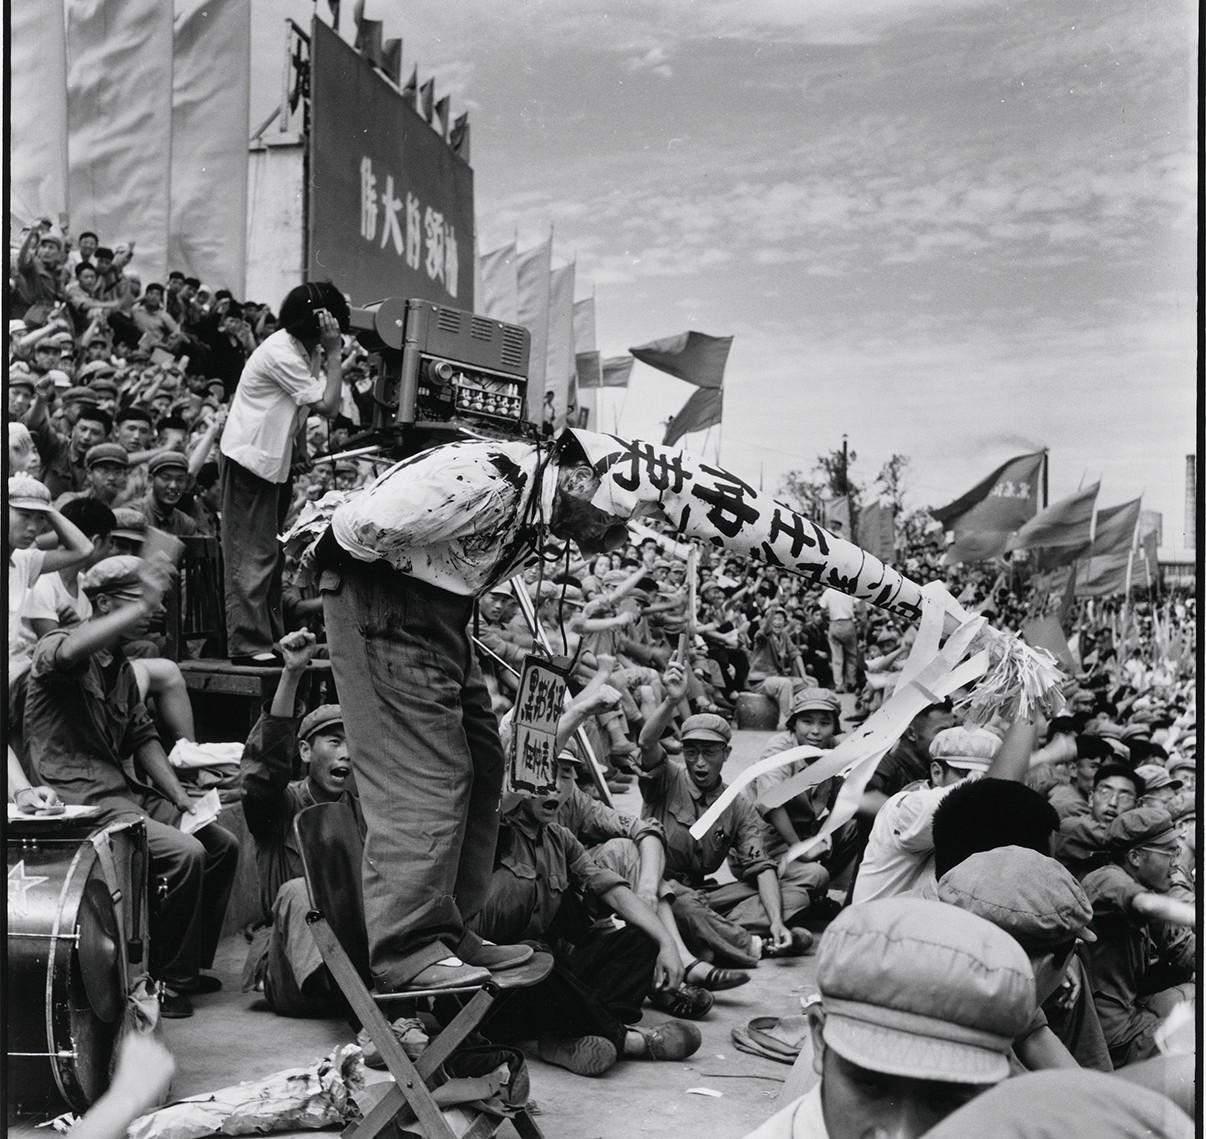 Public struggle during Cultural Revolution